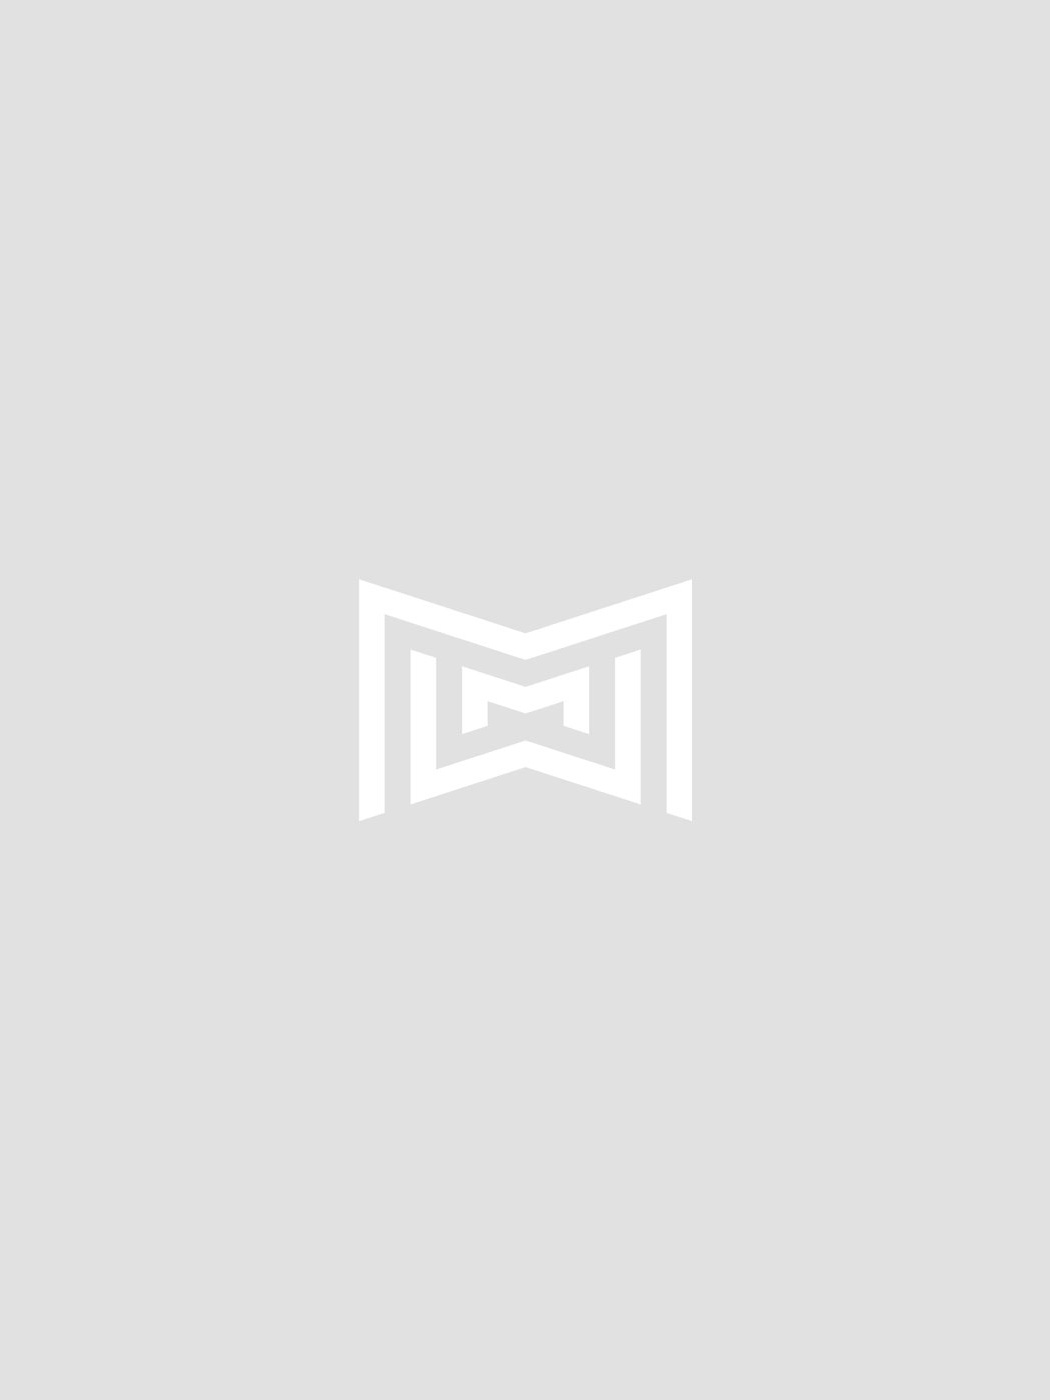 MWM-Placeholder-Profile.jpg